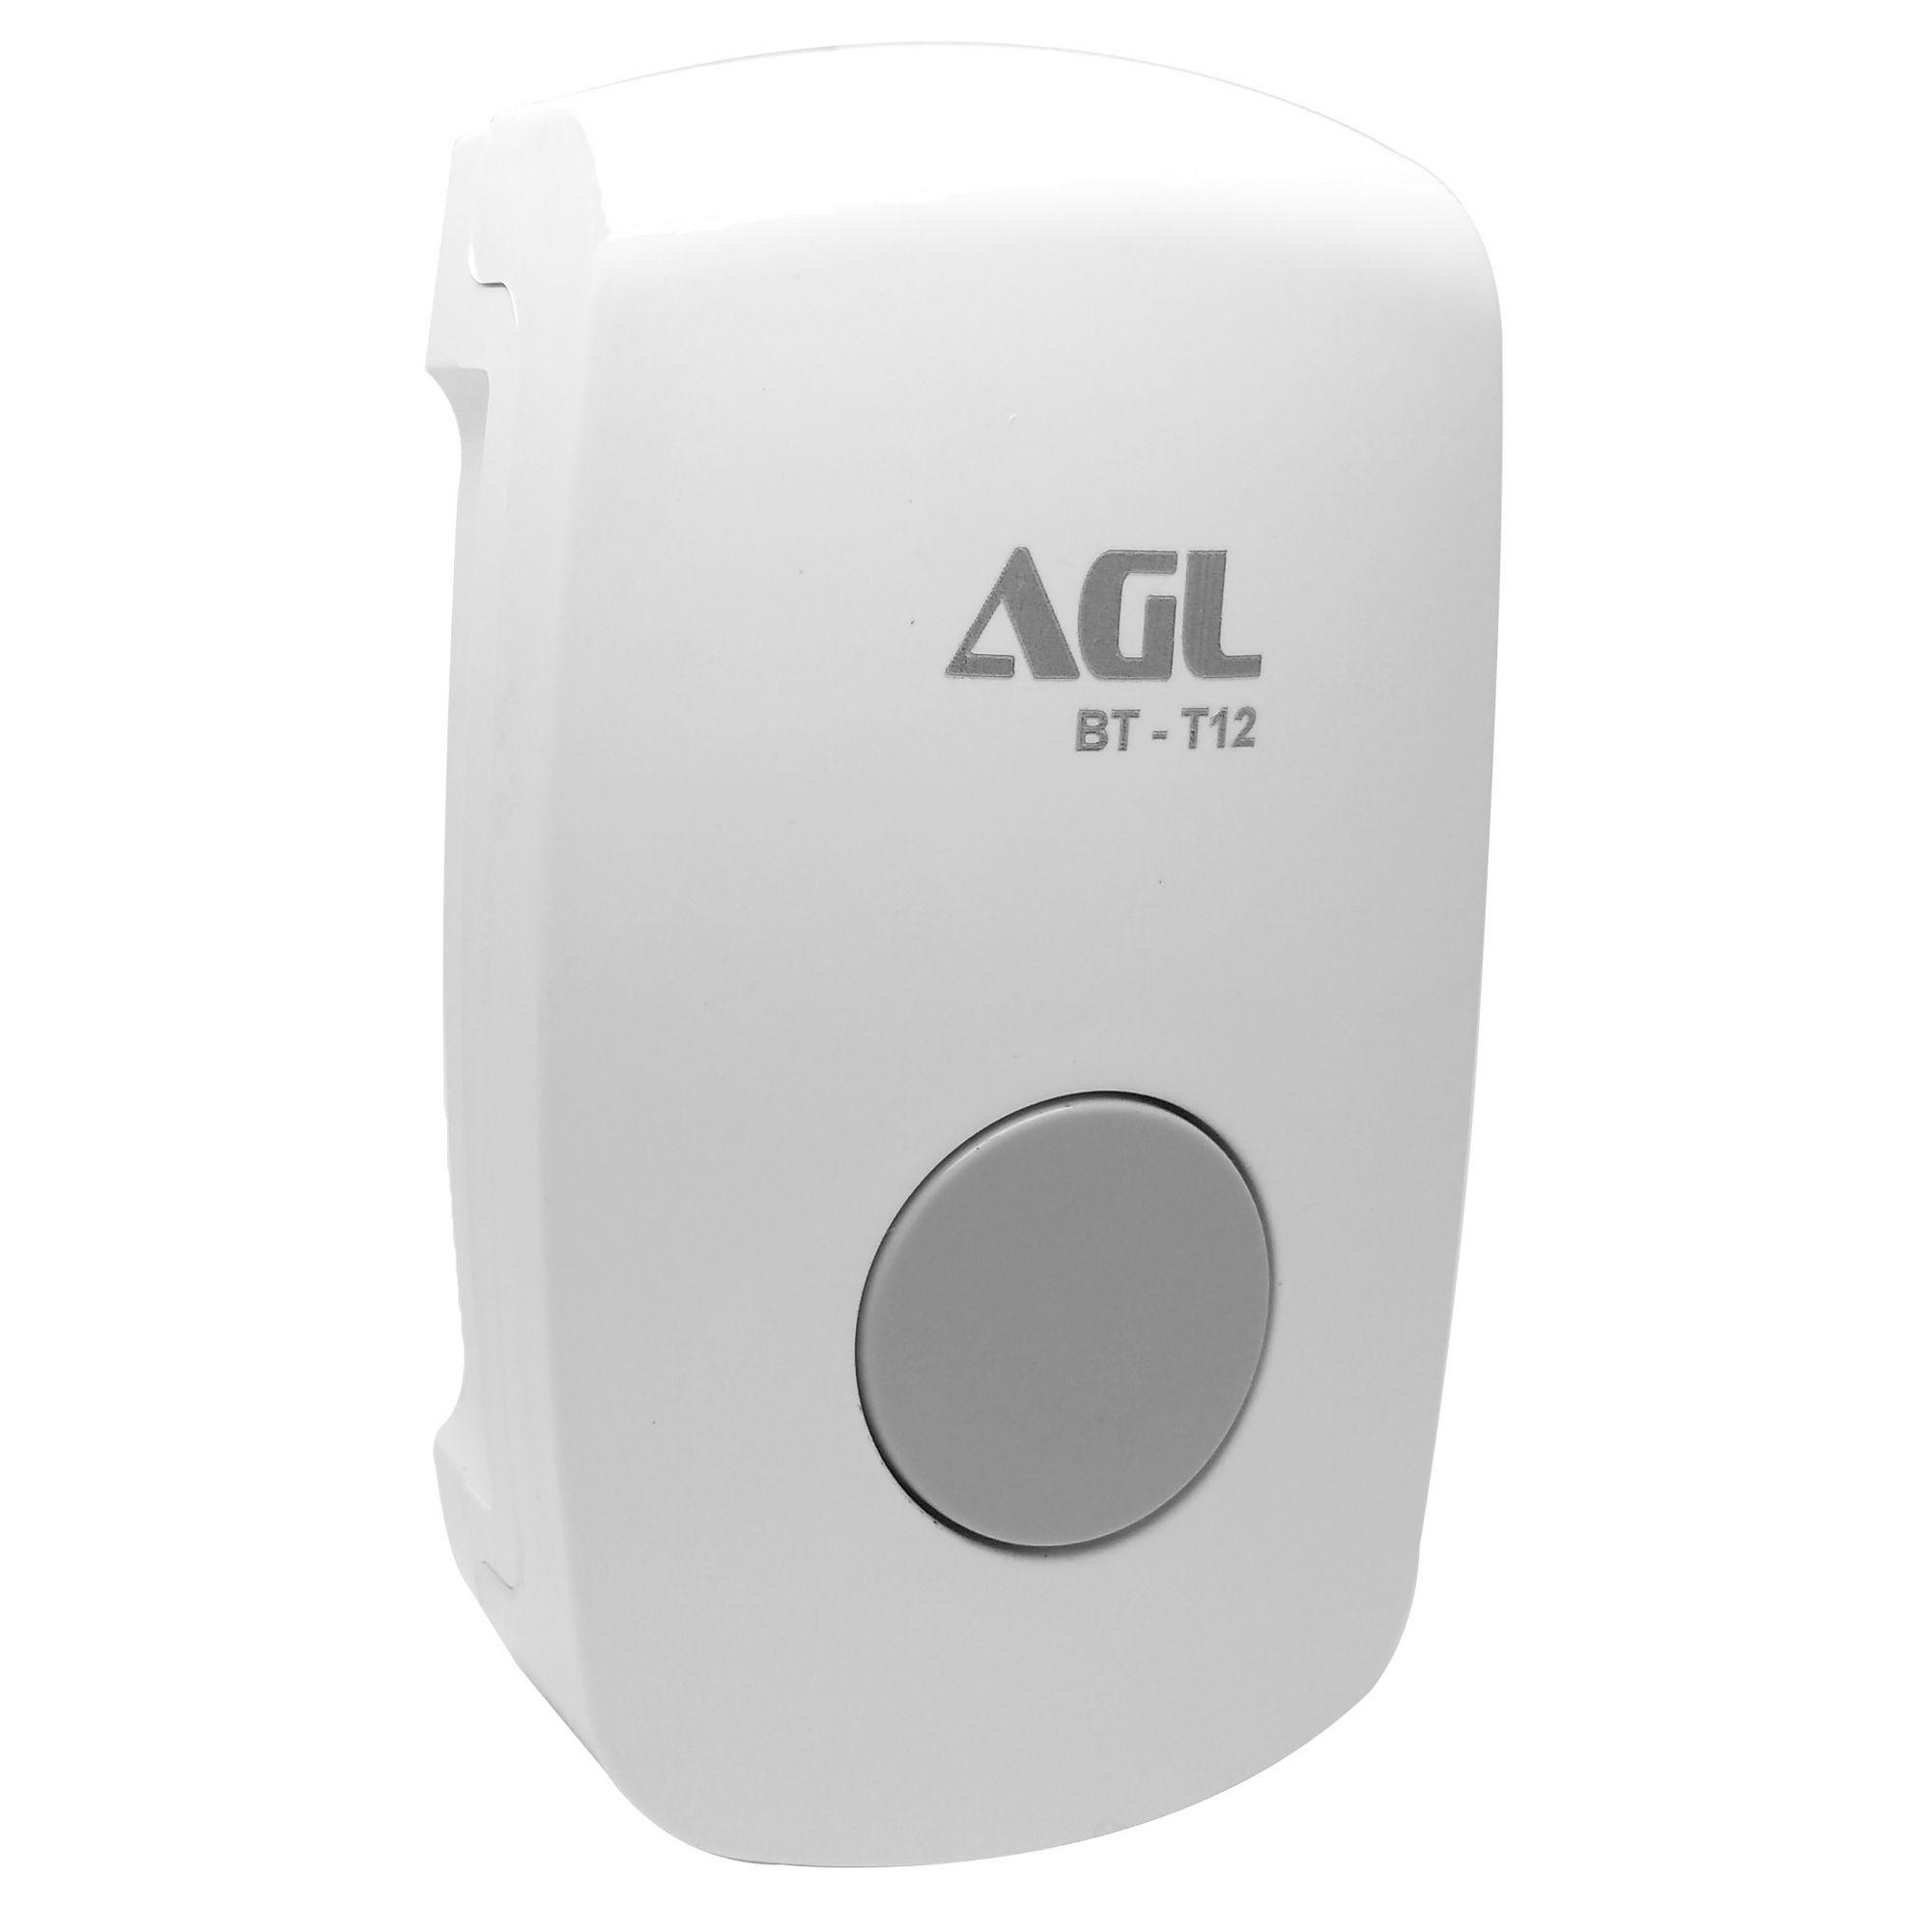 Botoeira AGL - 40048